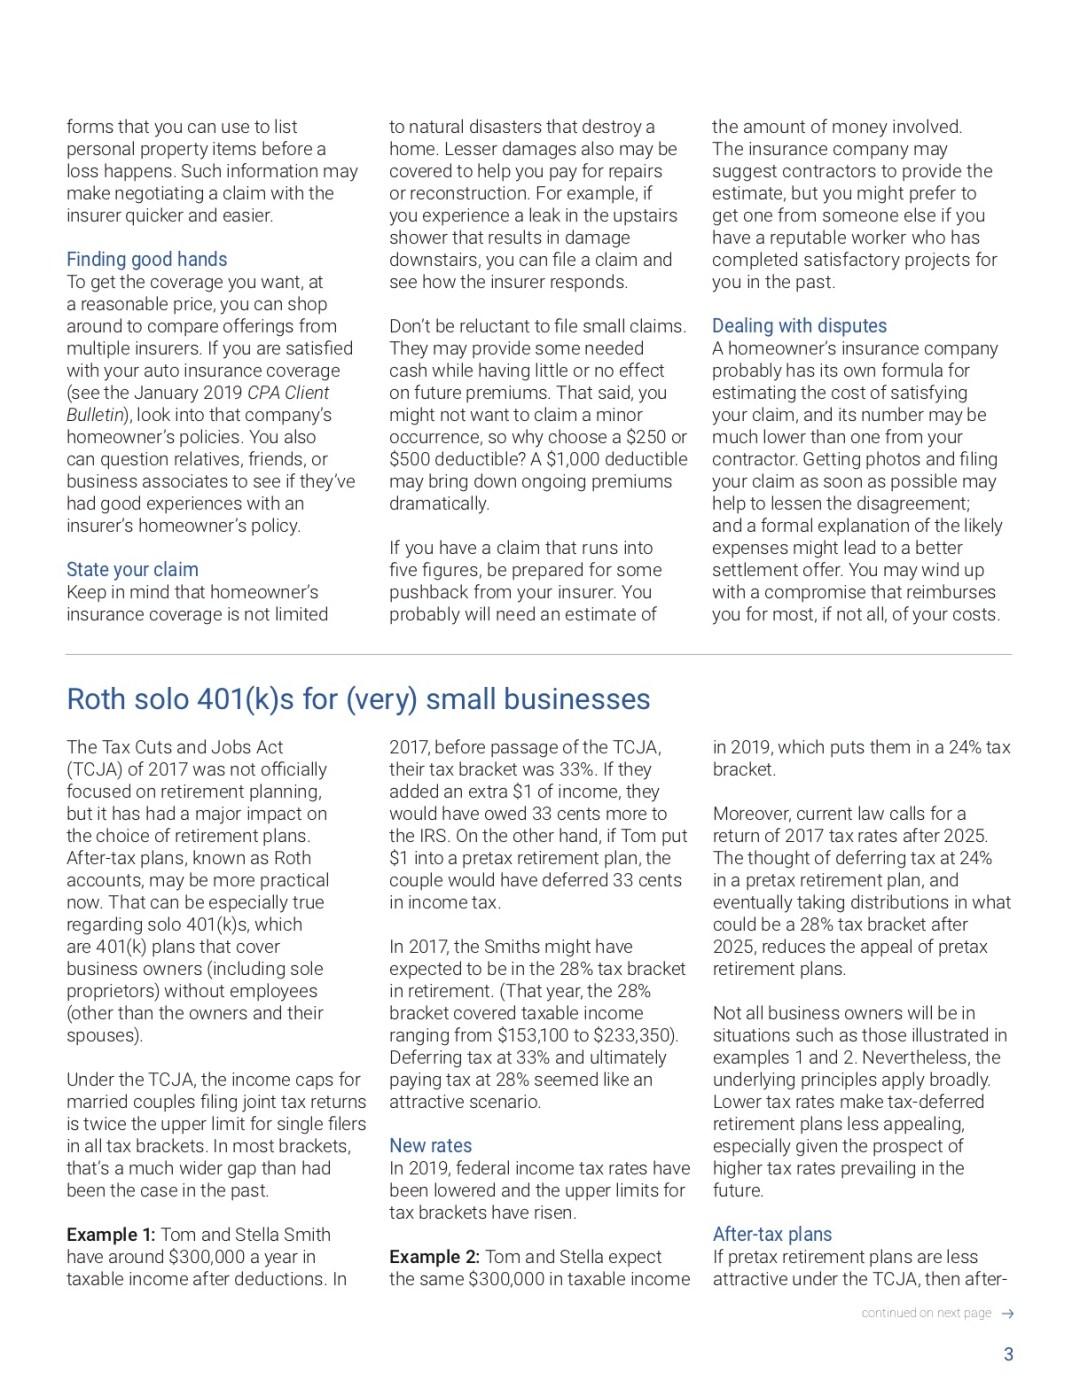 Standard deduction, homeowner's insurance, Roth solo 401k, tax calendar